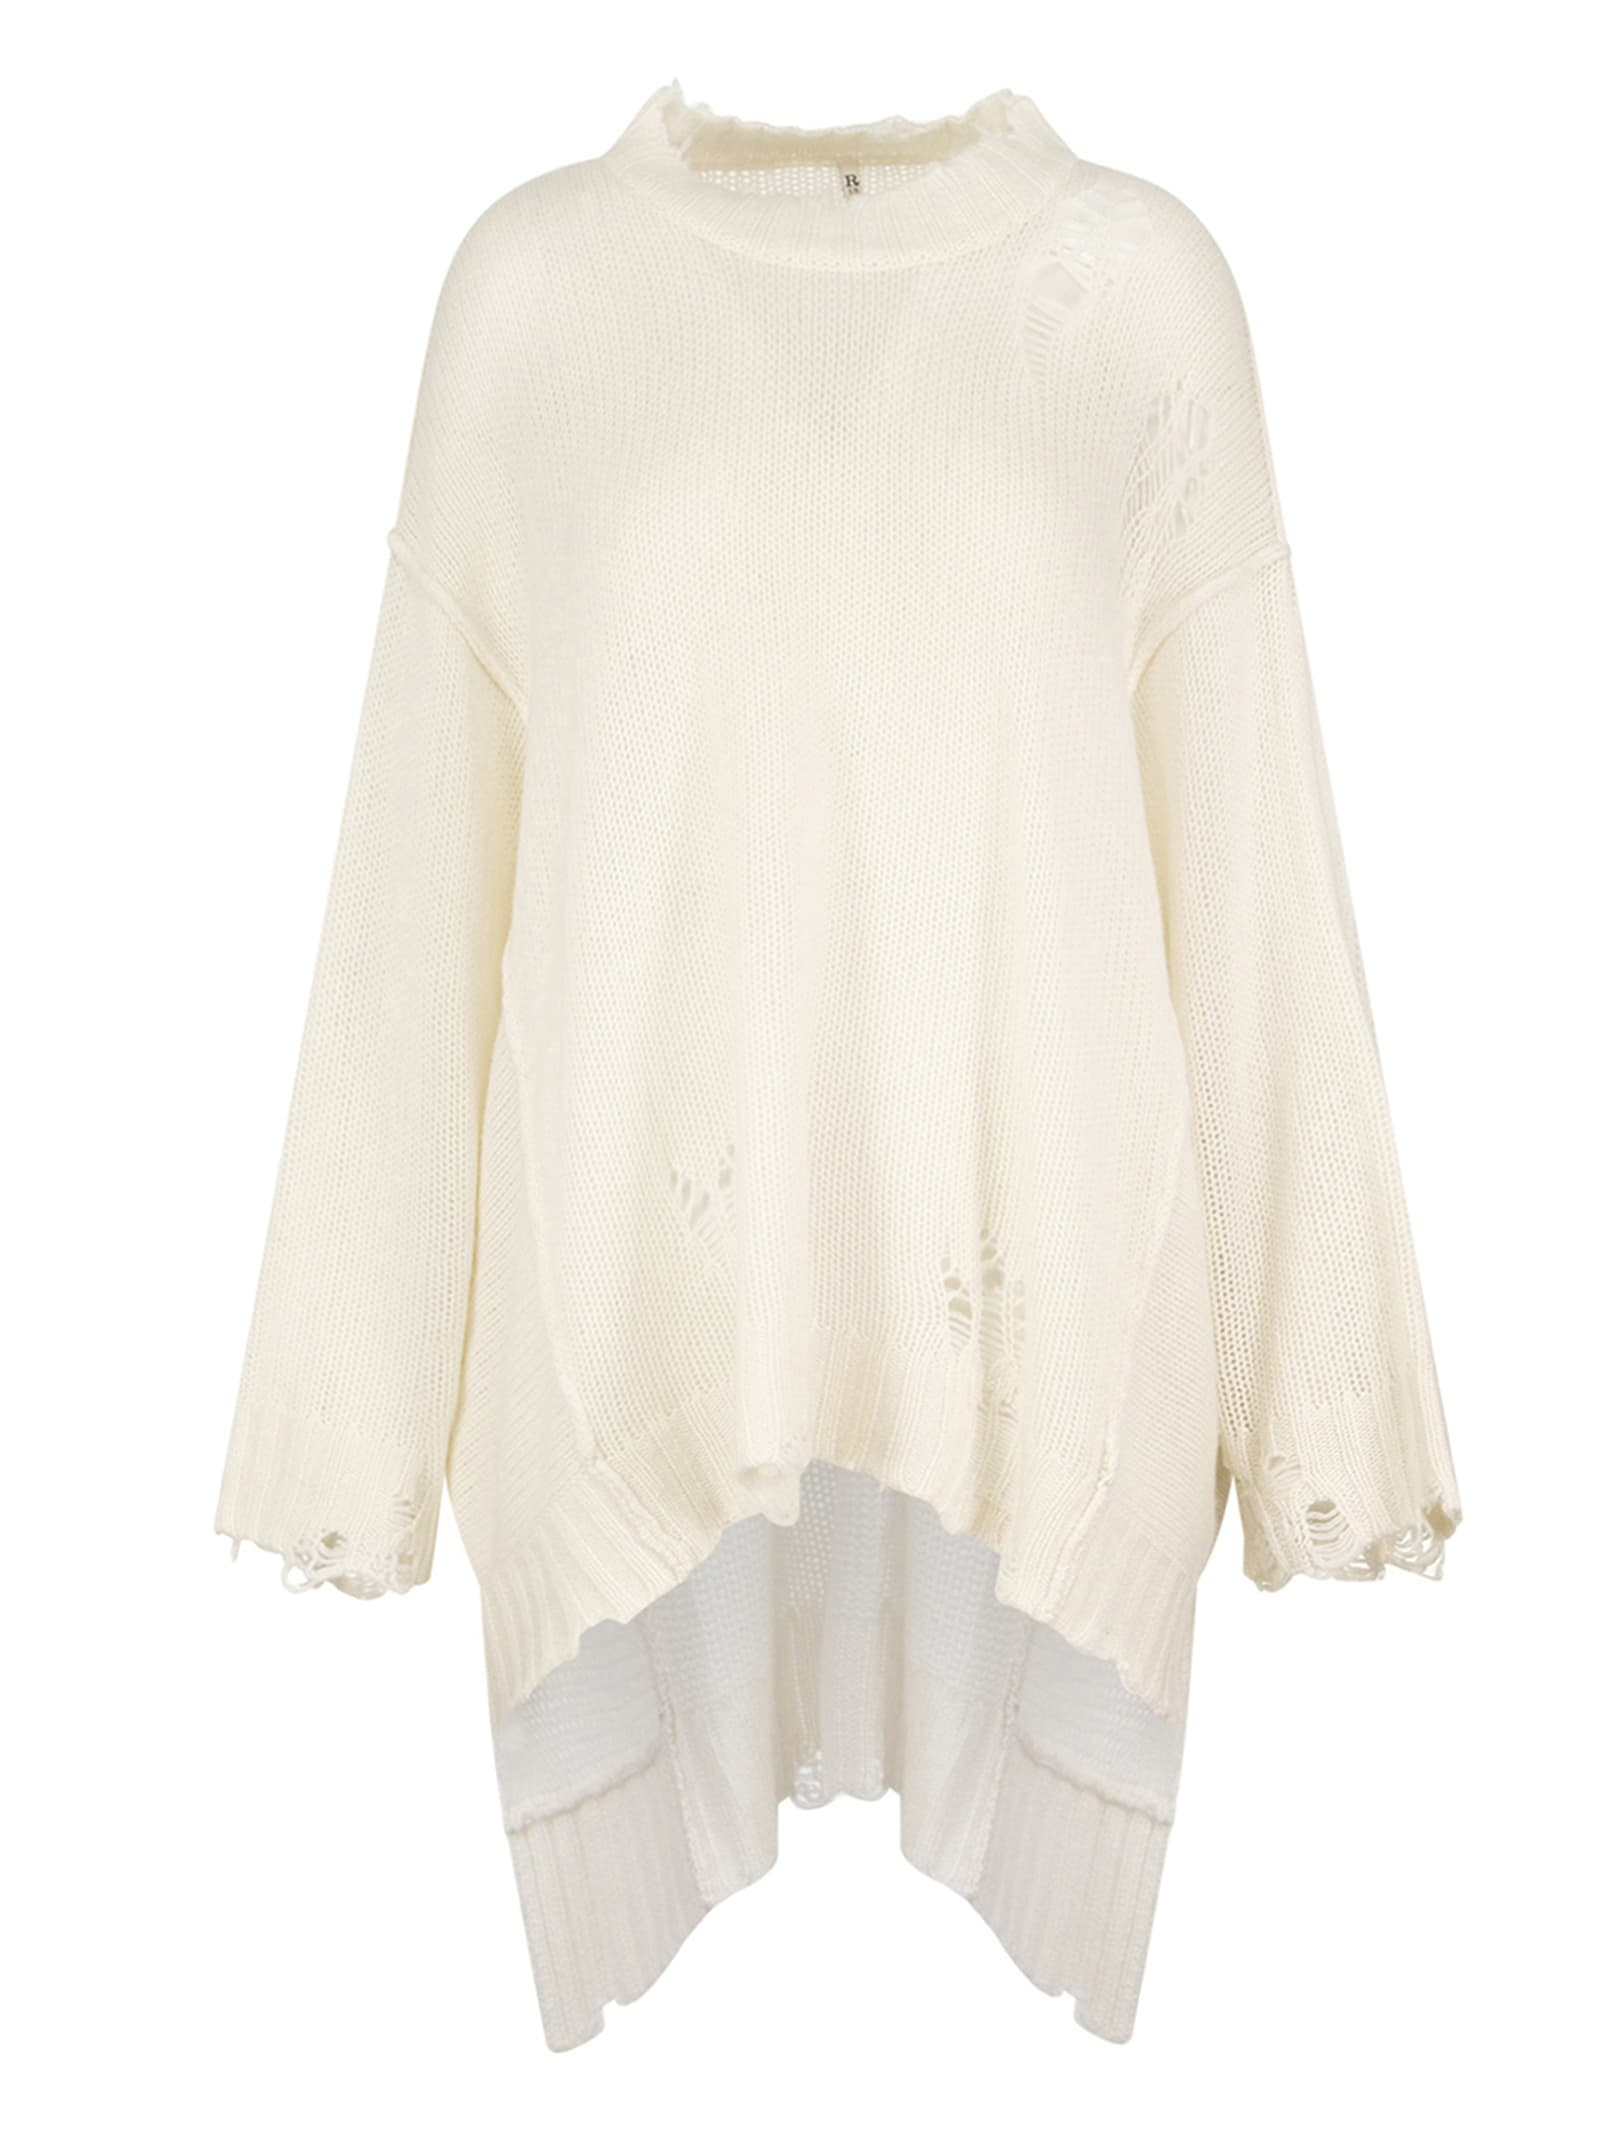 R13 Sweater